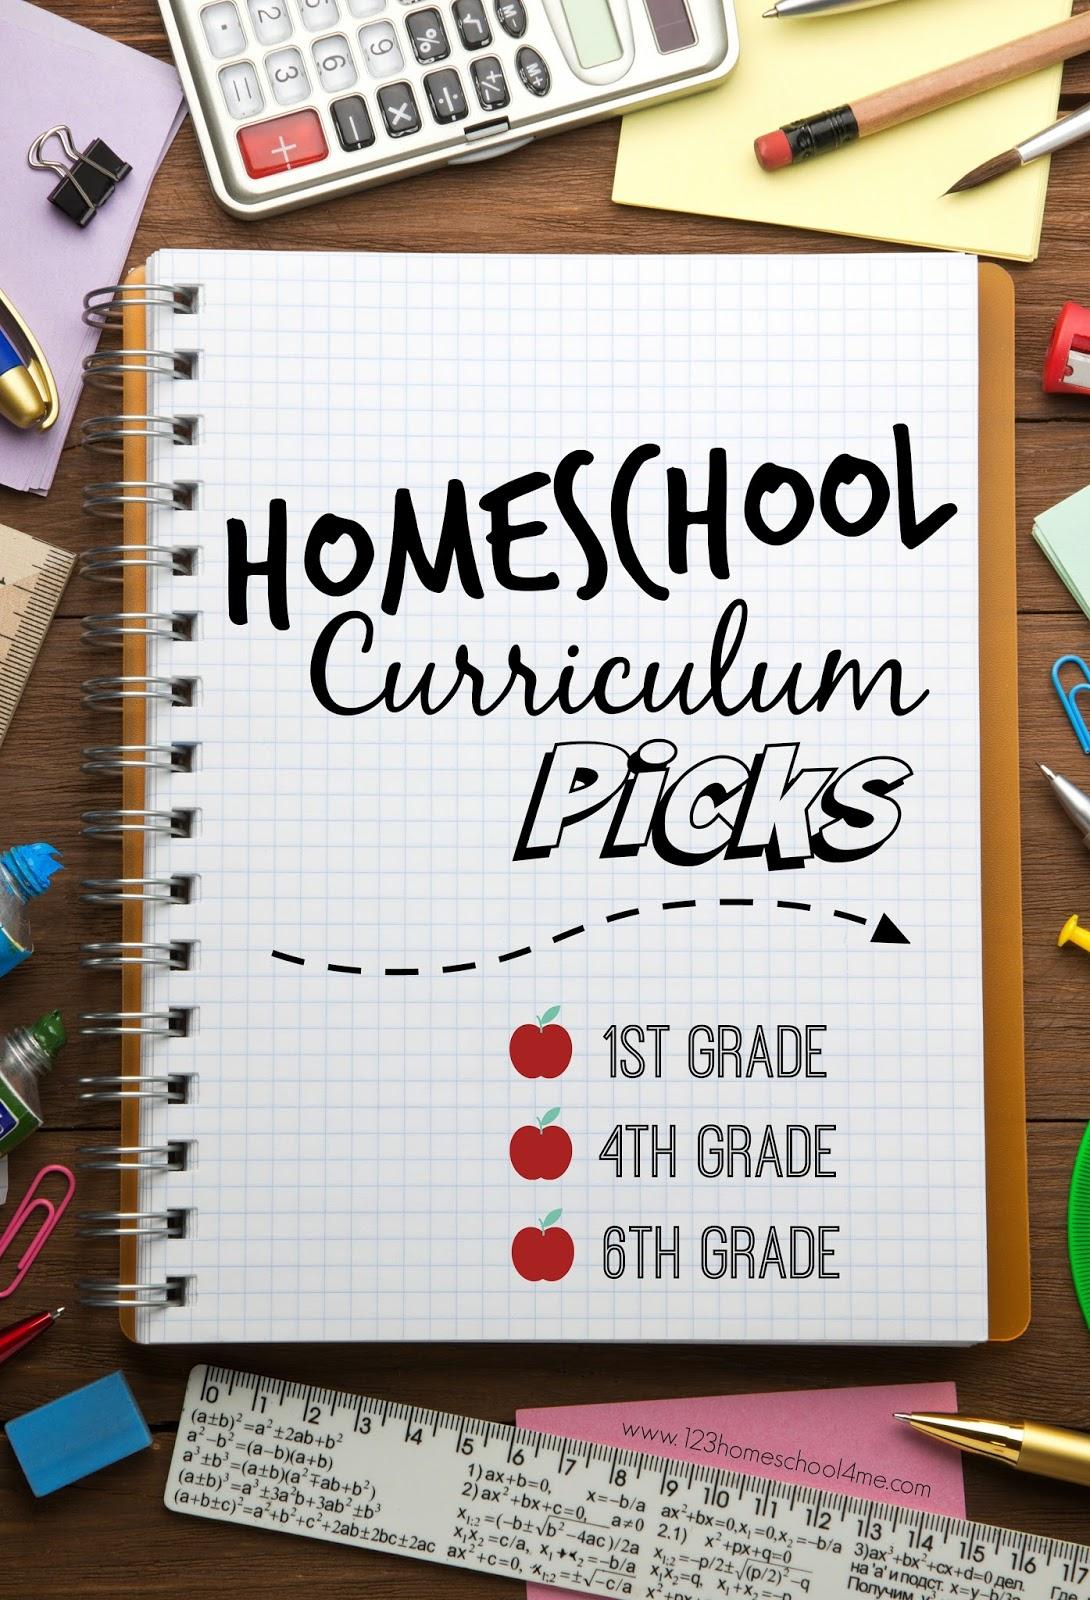 Our Curriculum Picks 1st 4th 6th Grade